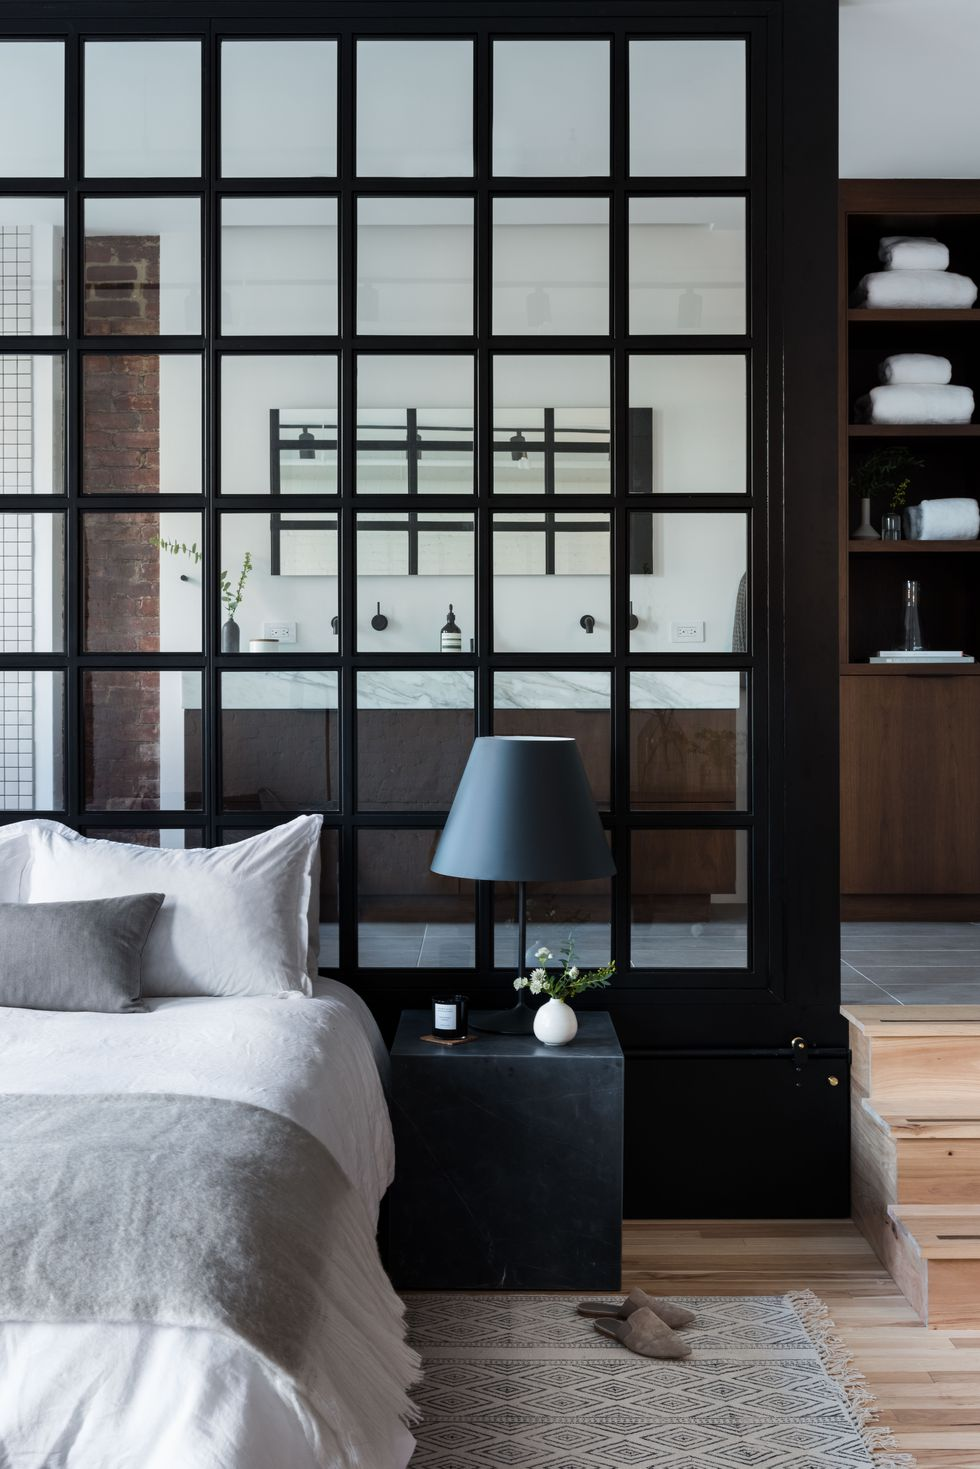 Glazen wand zwarte kozijnen slaapkamer badkamer